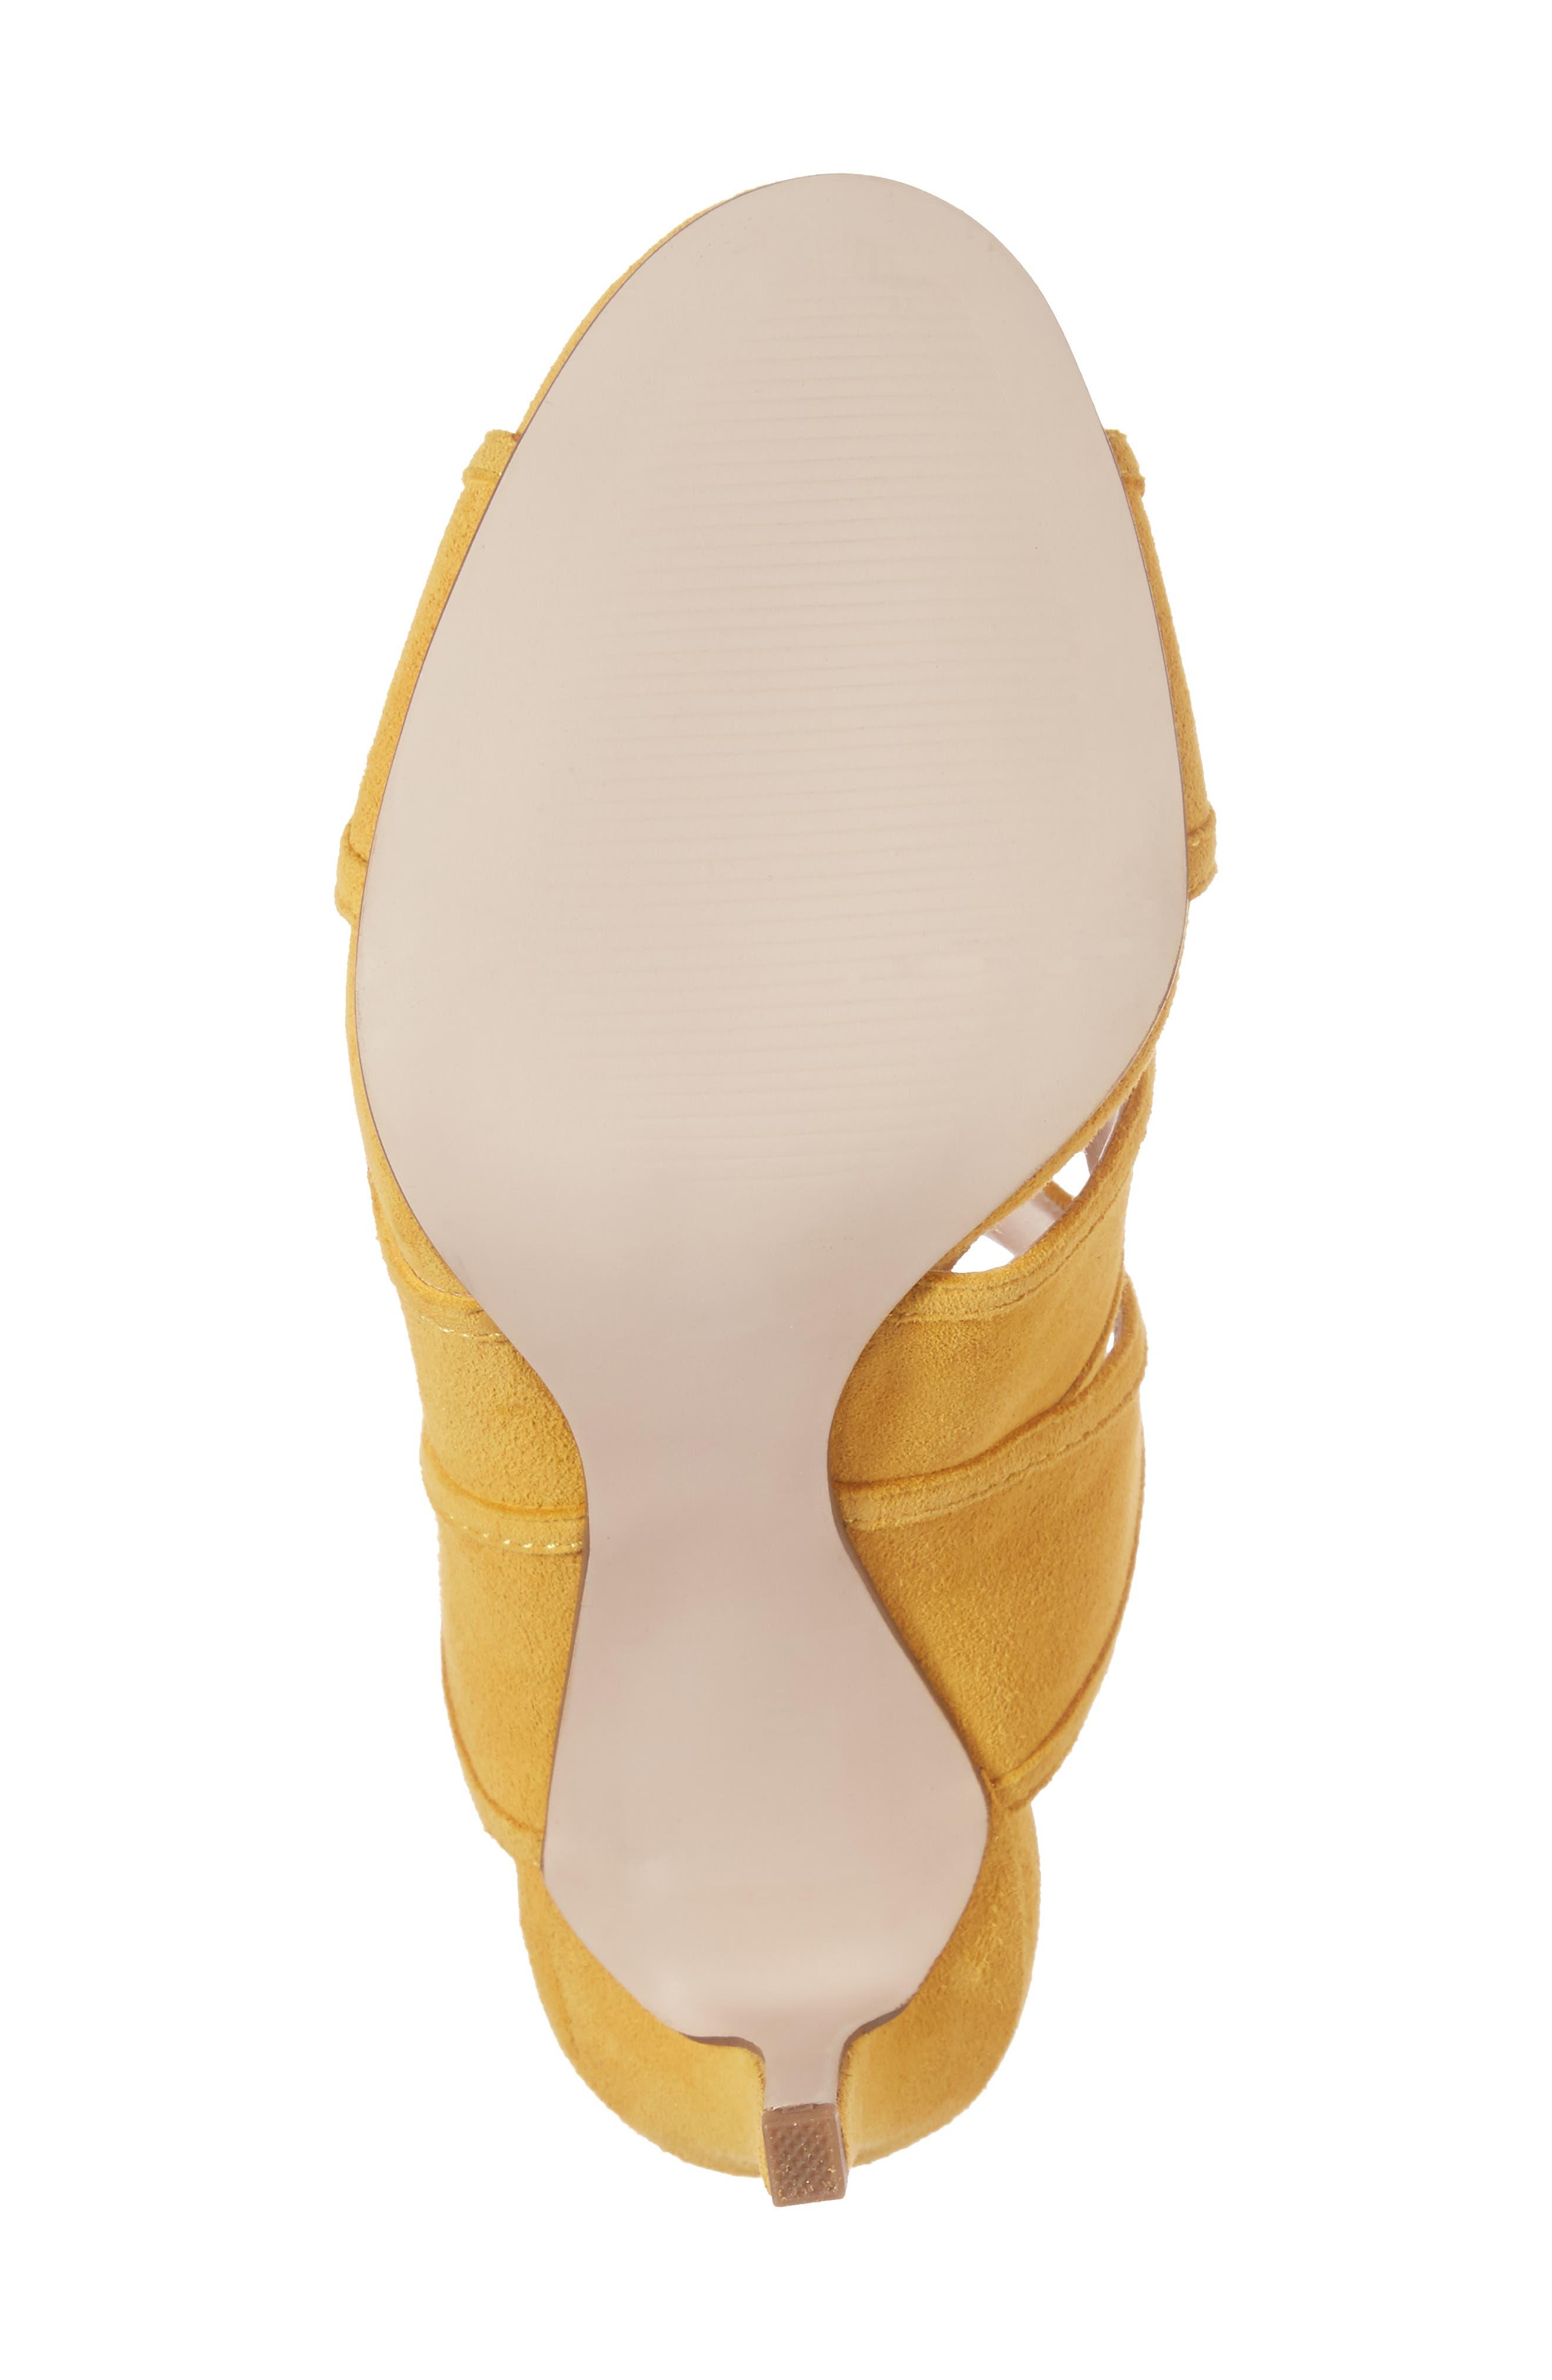 Esme Cross Strap Sandal,                             Alternate thumbnail 6, color,                             Spicy Mustard Suede